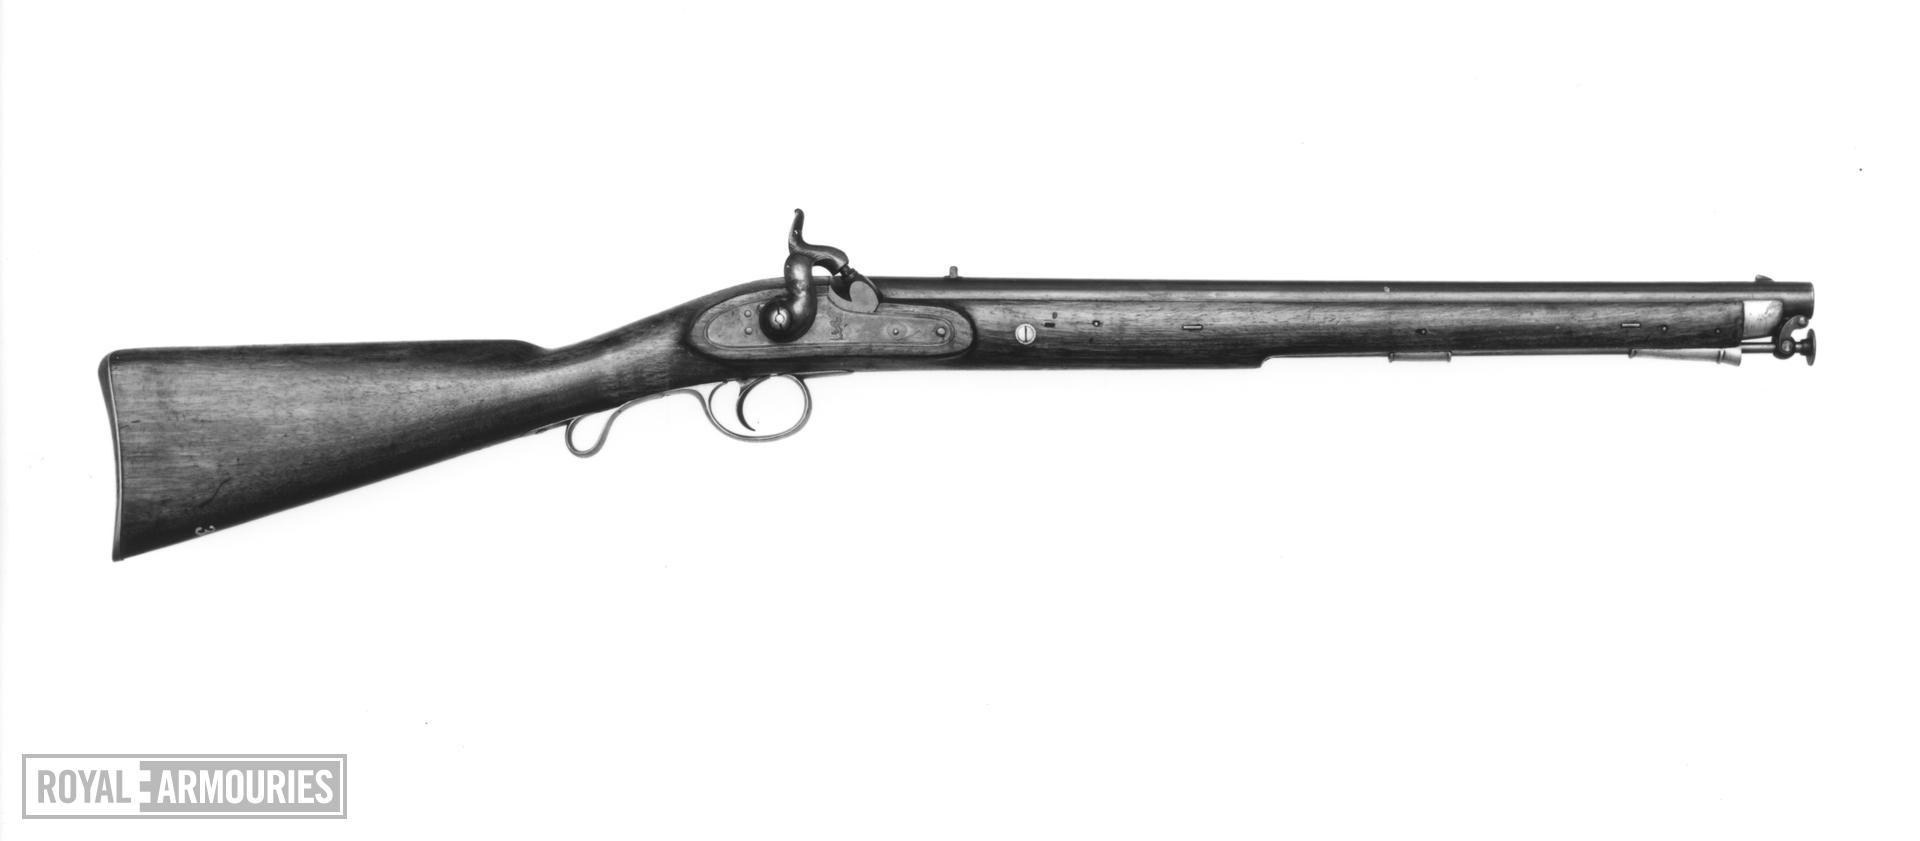 Percussion muzzle-loading military carbine